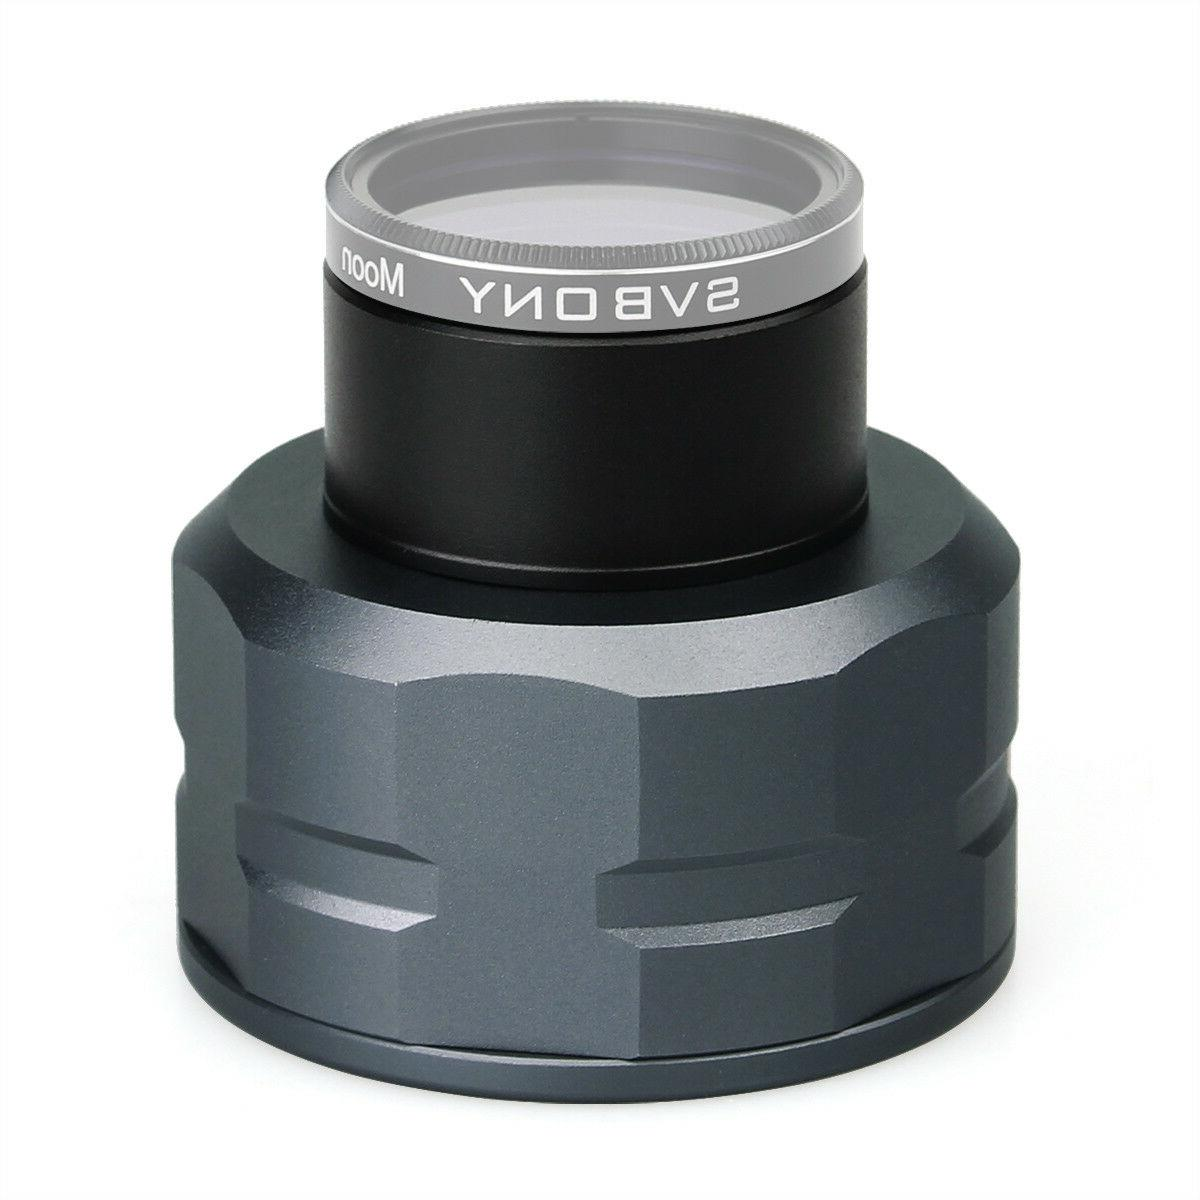 SVBONY Telescopes Electronic Eyepieces Camera+